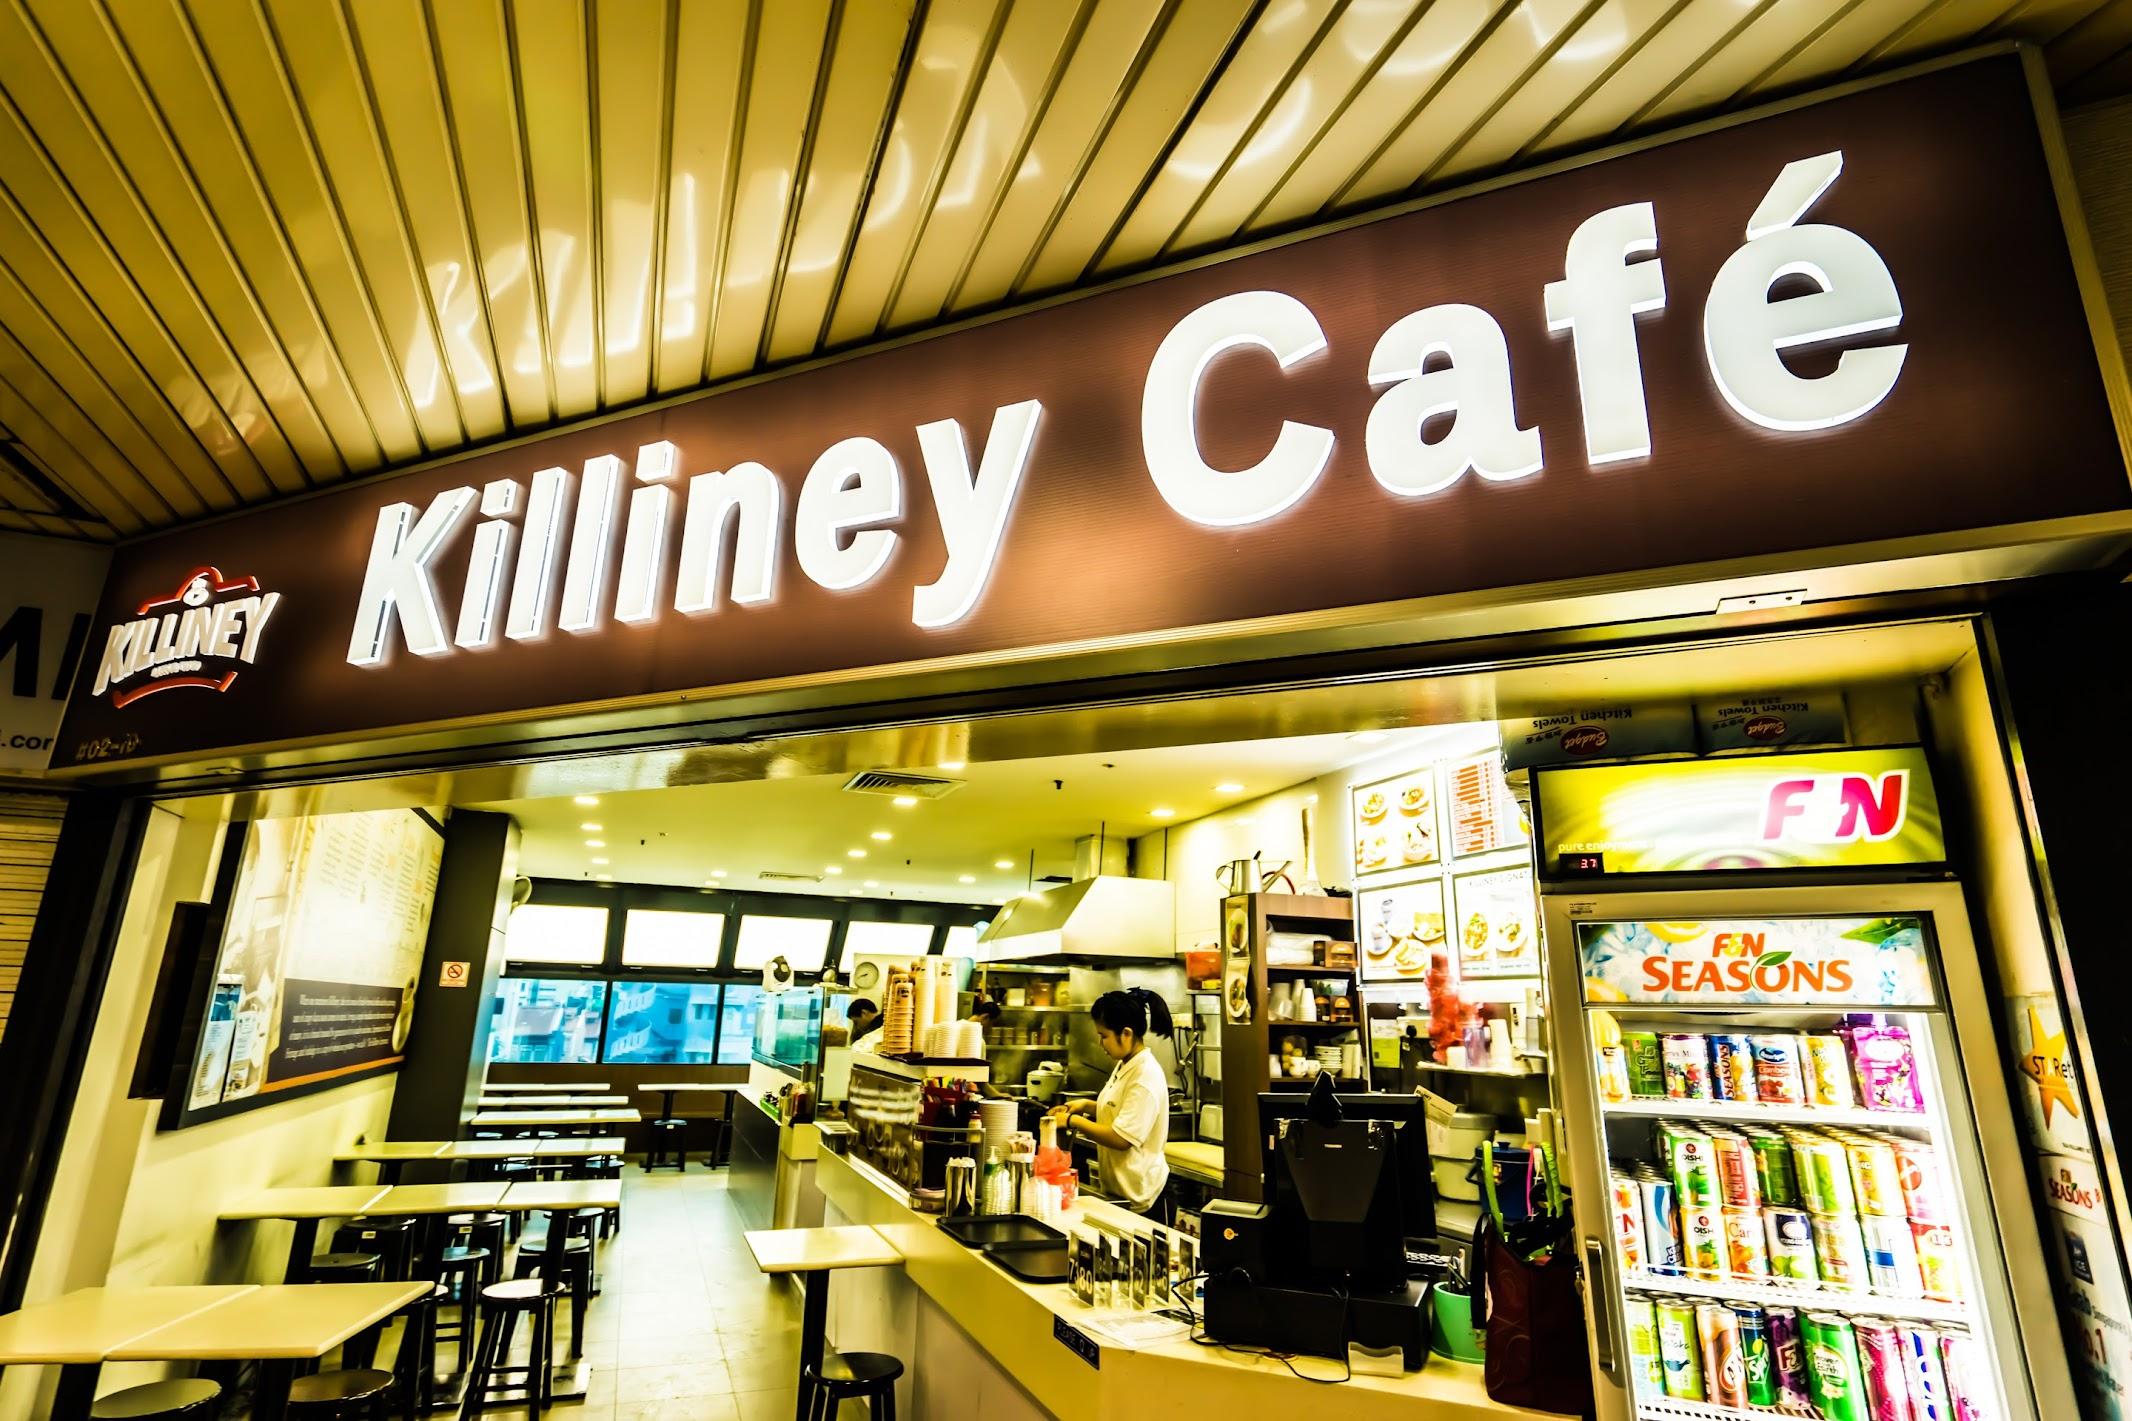 Singapore Killiney